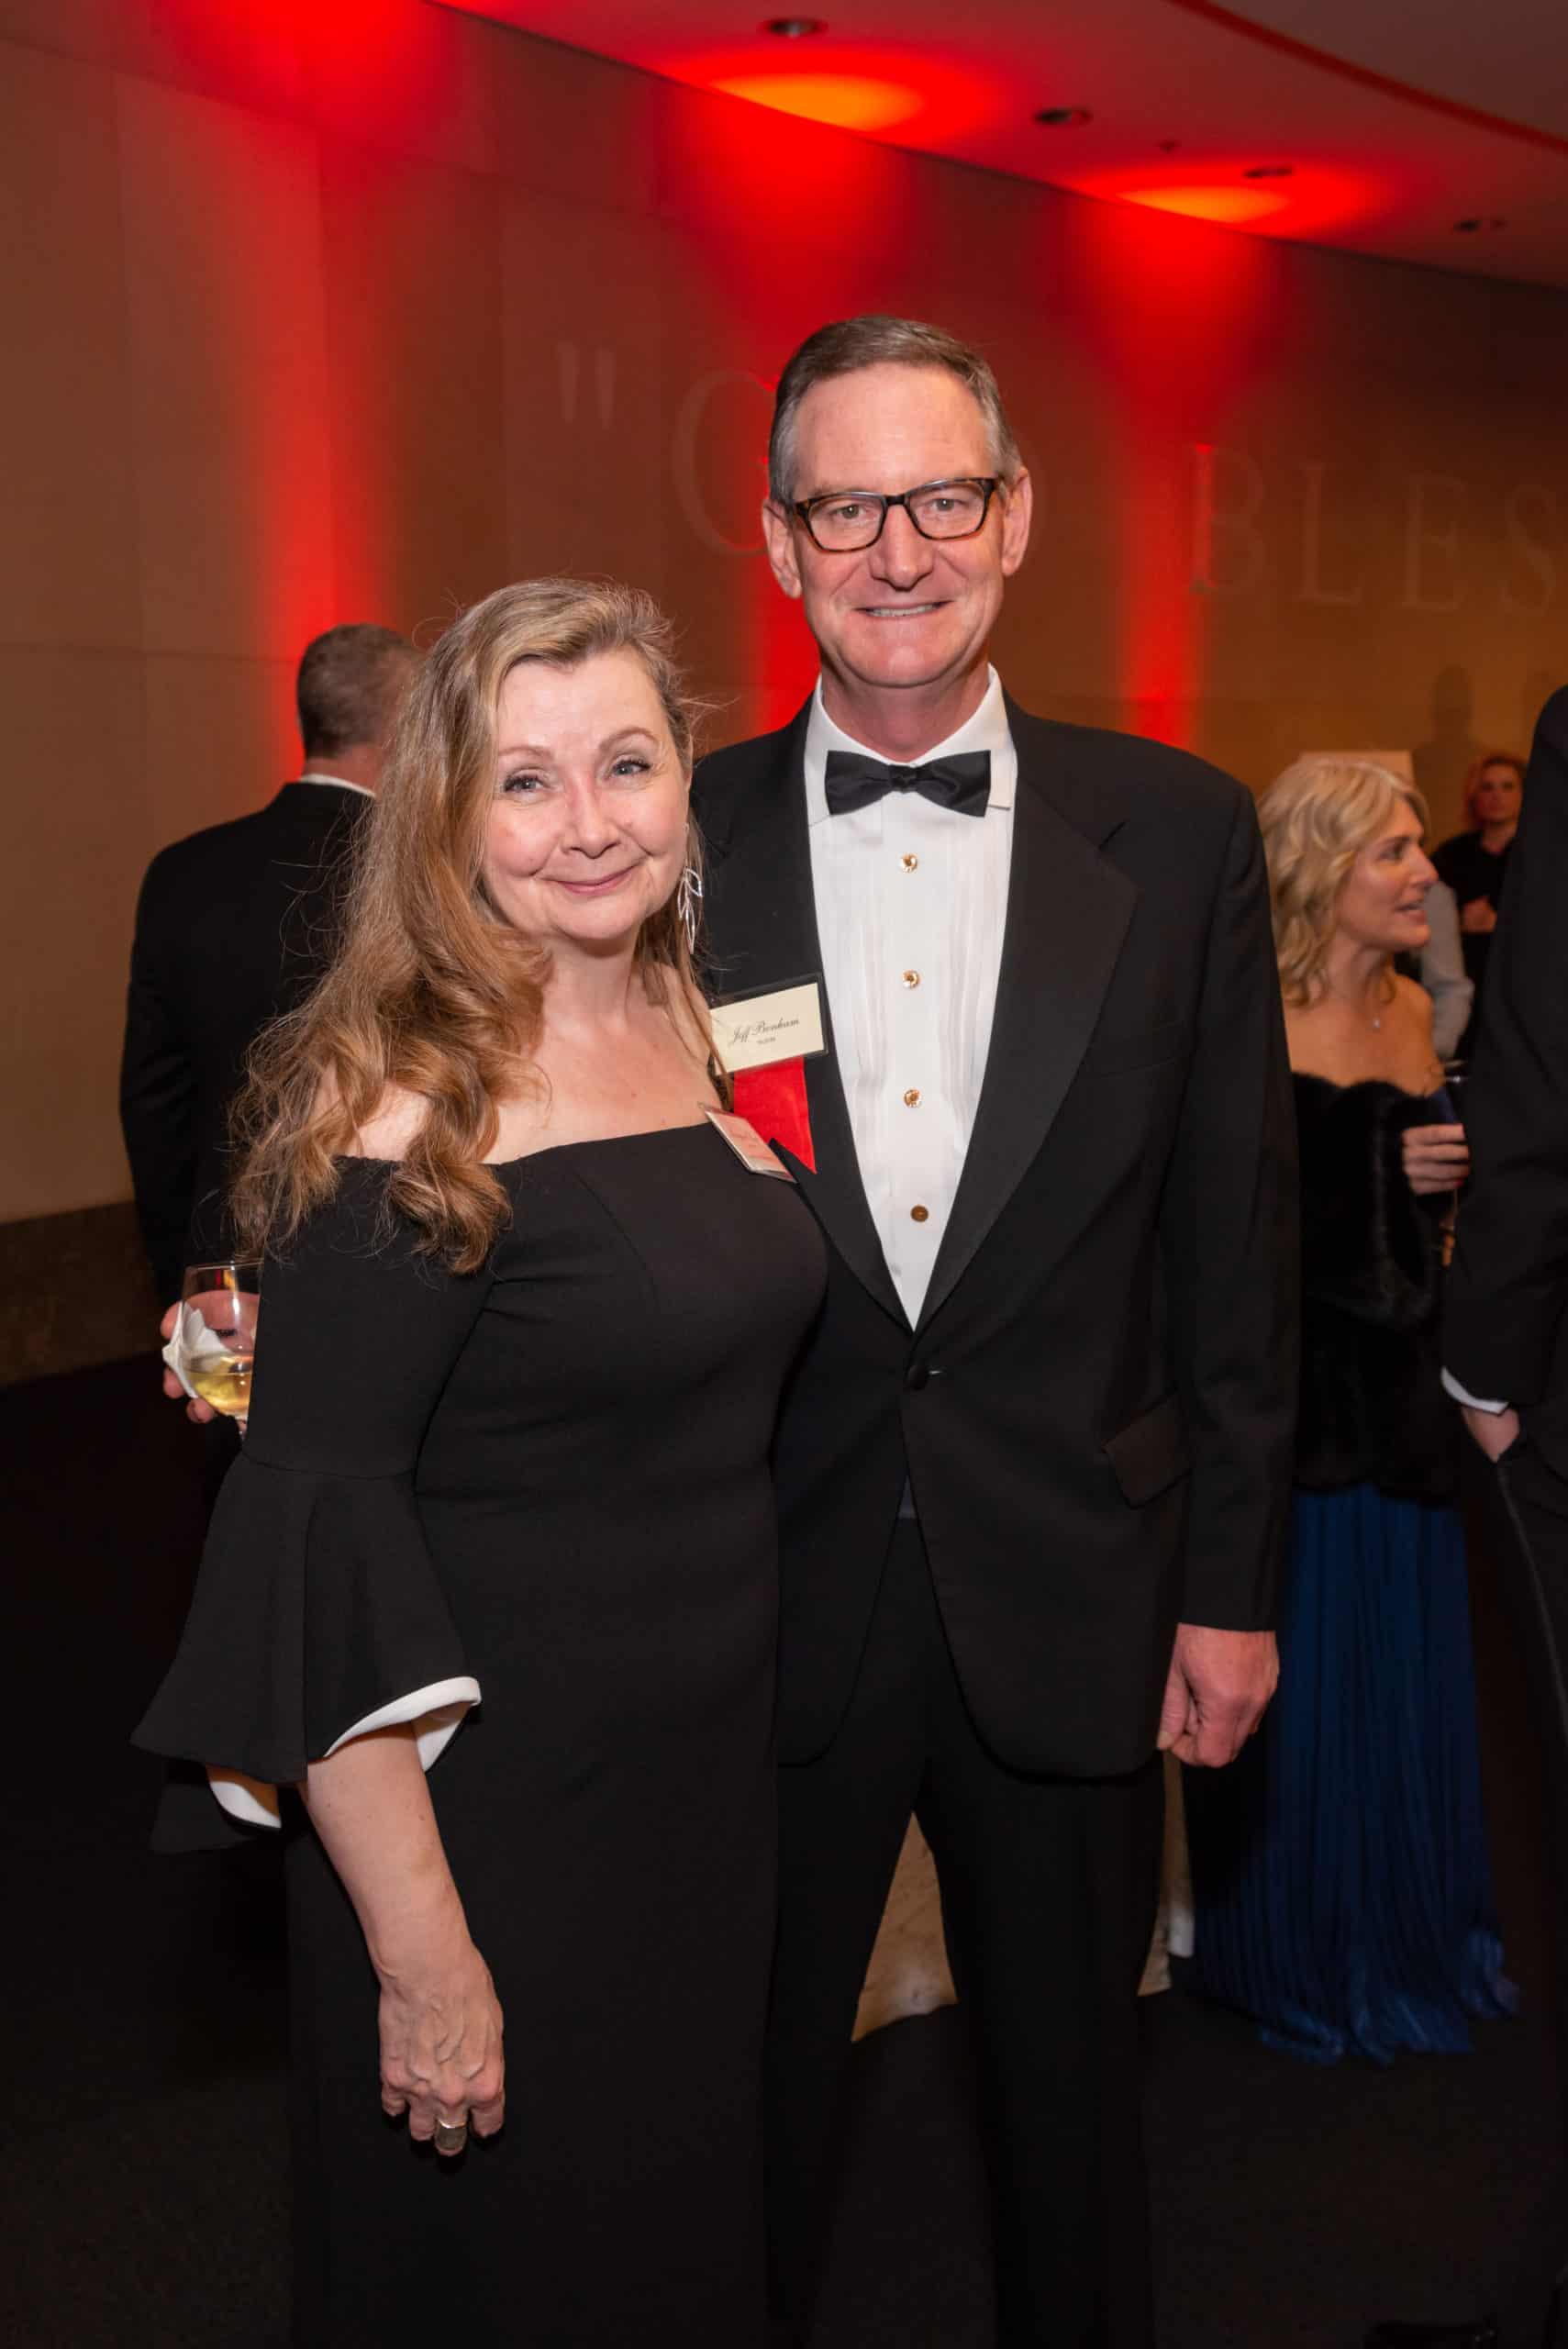 Margaret Koch and Jeff Bonham